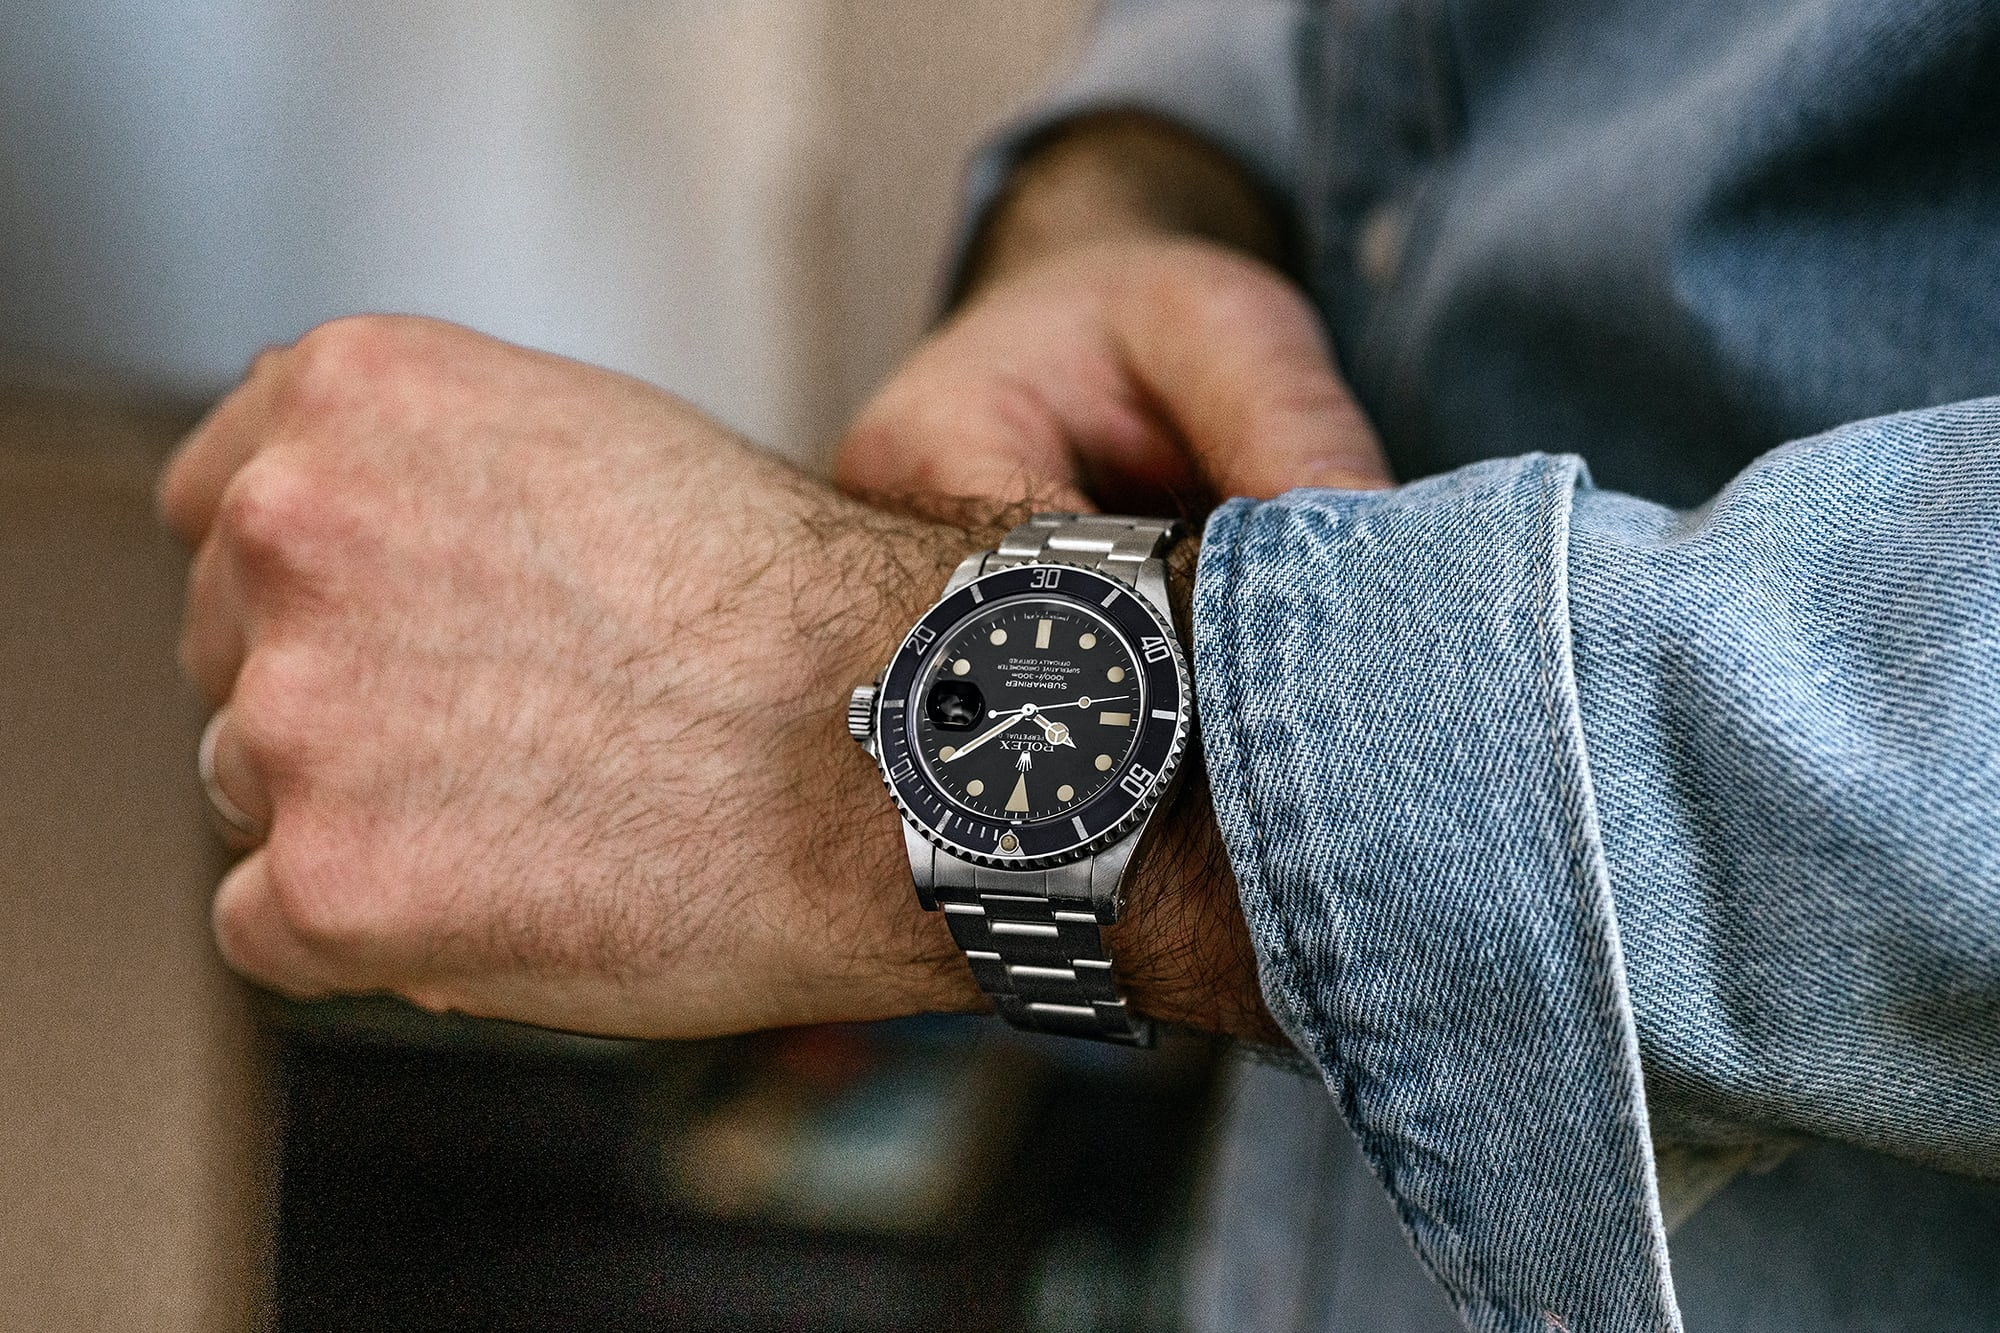 "<p><a href=""https://shop.hodinkee.com/products/submariner-16800-7477125"" rel=""noopener"" target=""_blank""><u>1983 Rolex Submariner Ref. 16800 With Matte Dial</u></a></p>"